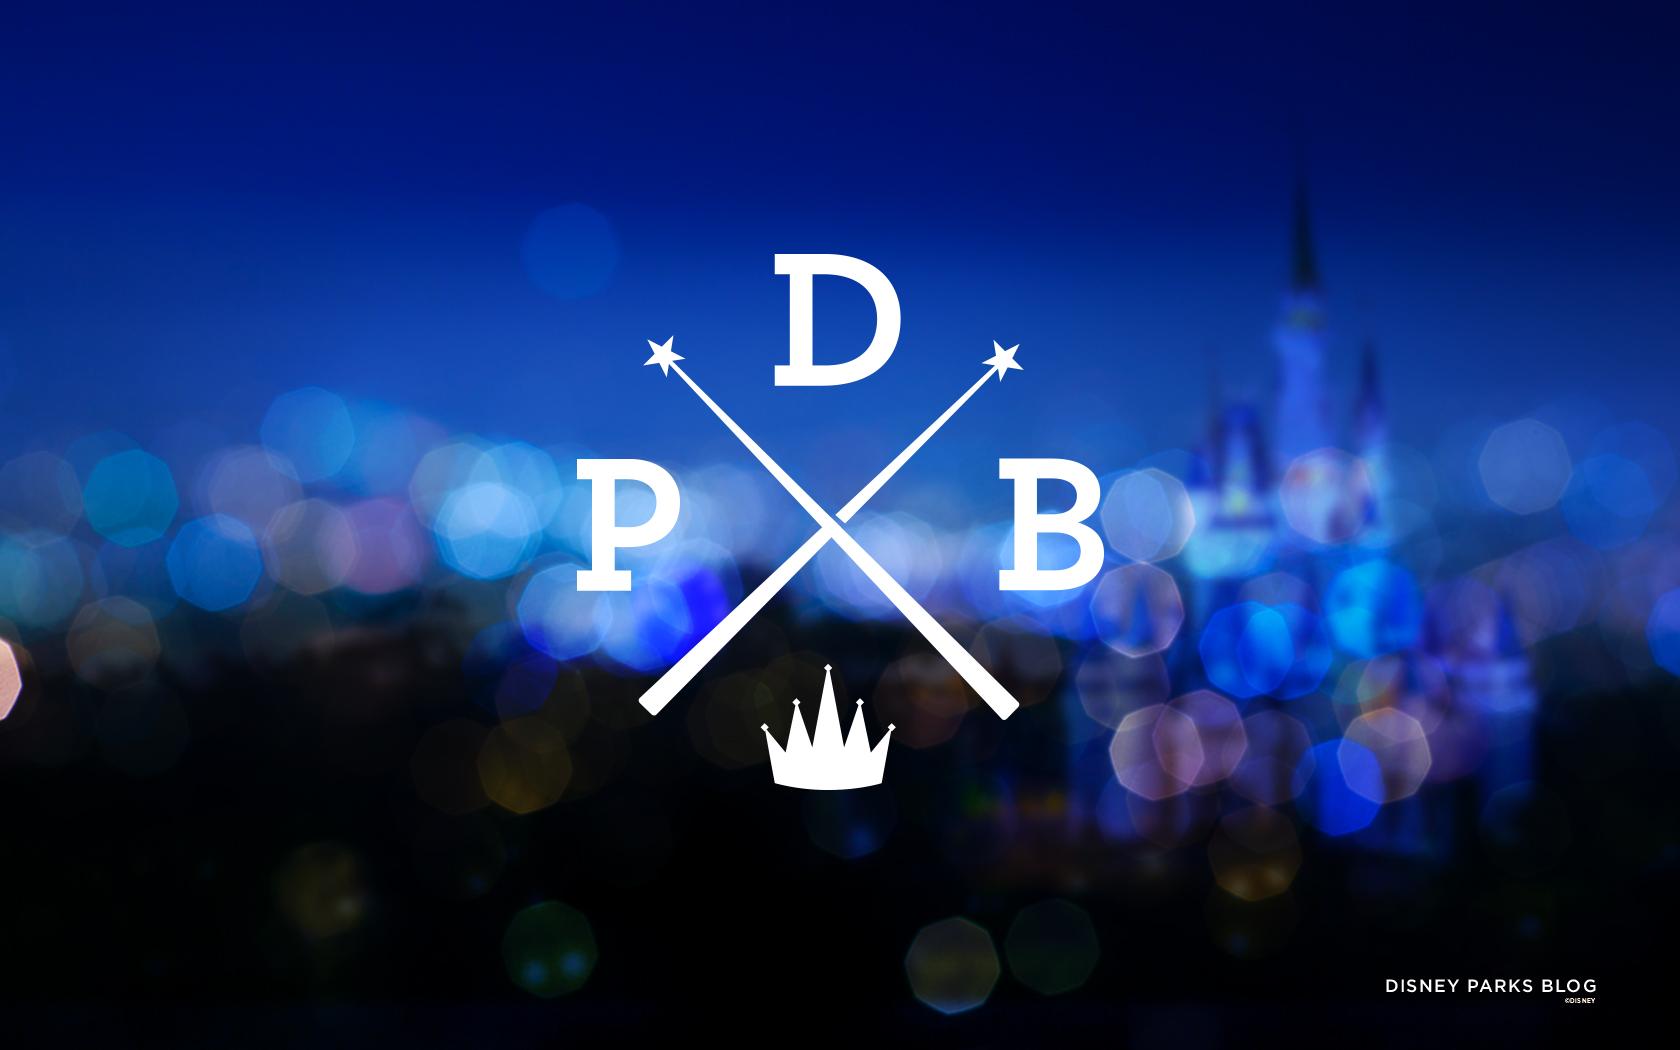 Wallpapers Disney Parks Blog 1680x1050